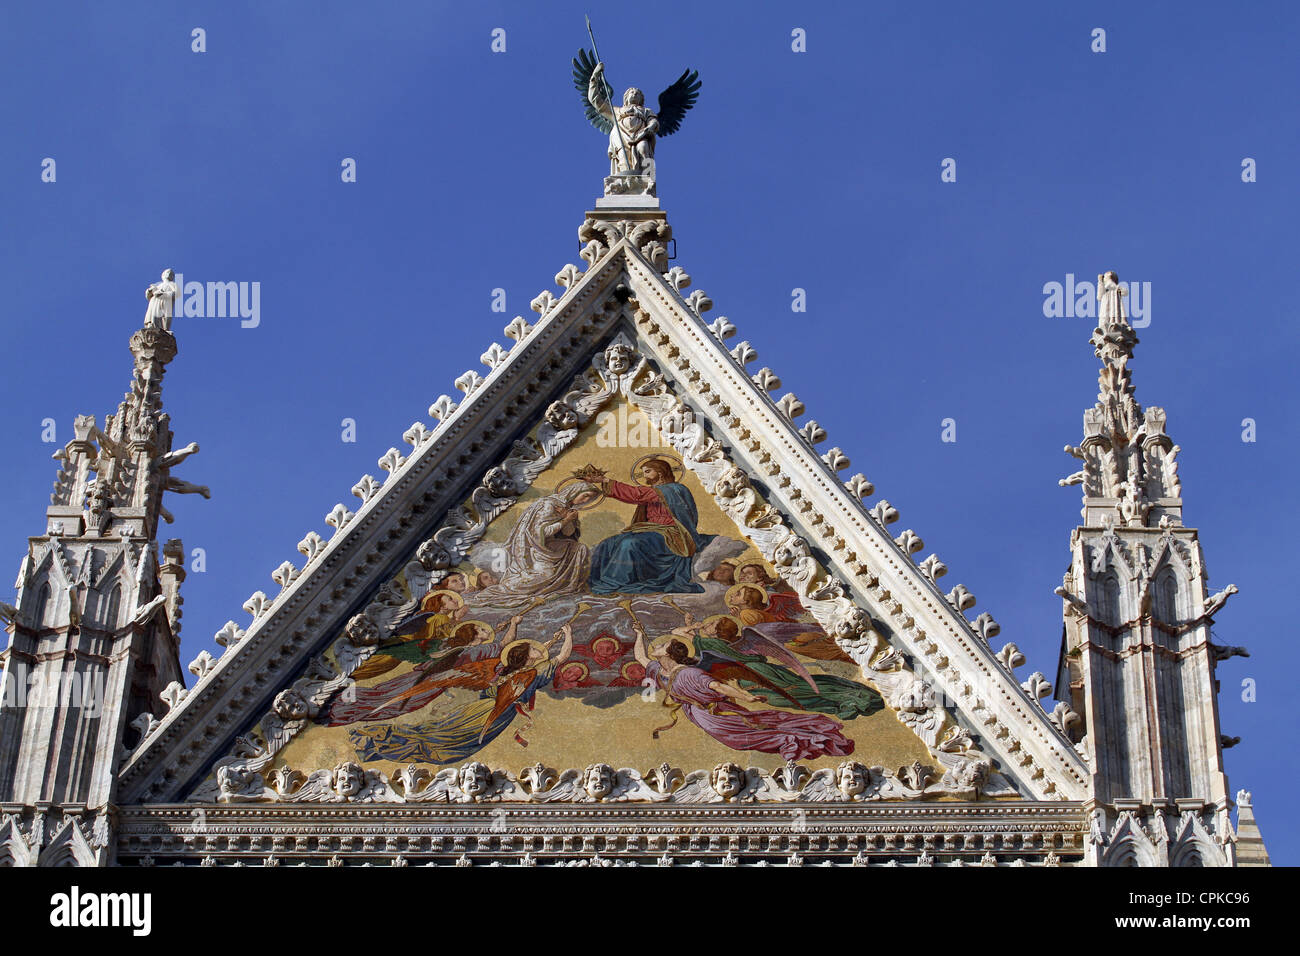 THE CATHEDRAL OF SIENA MAIN FACADE SIENA TUSCANY ITALY 10 May 2012 - Stock Image